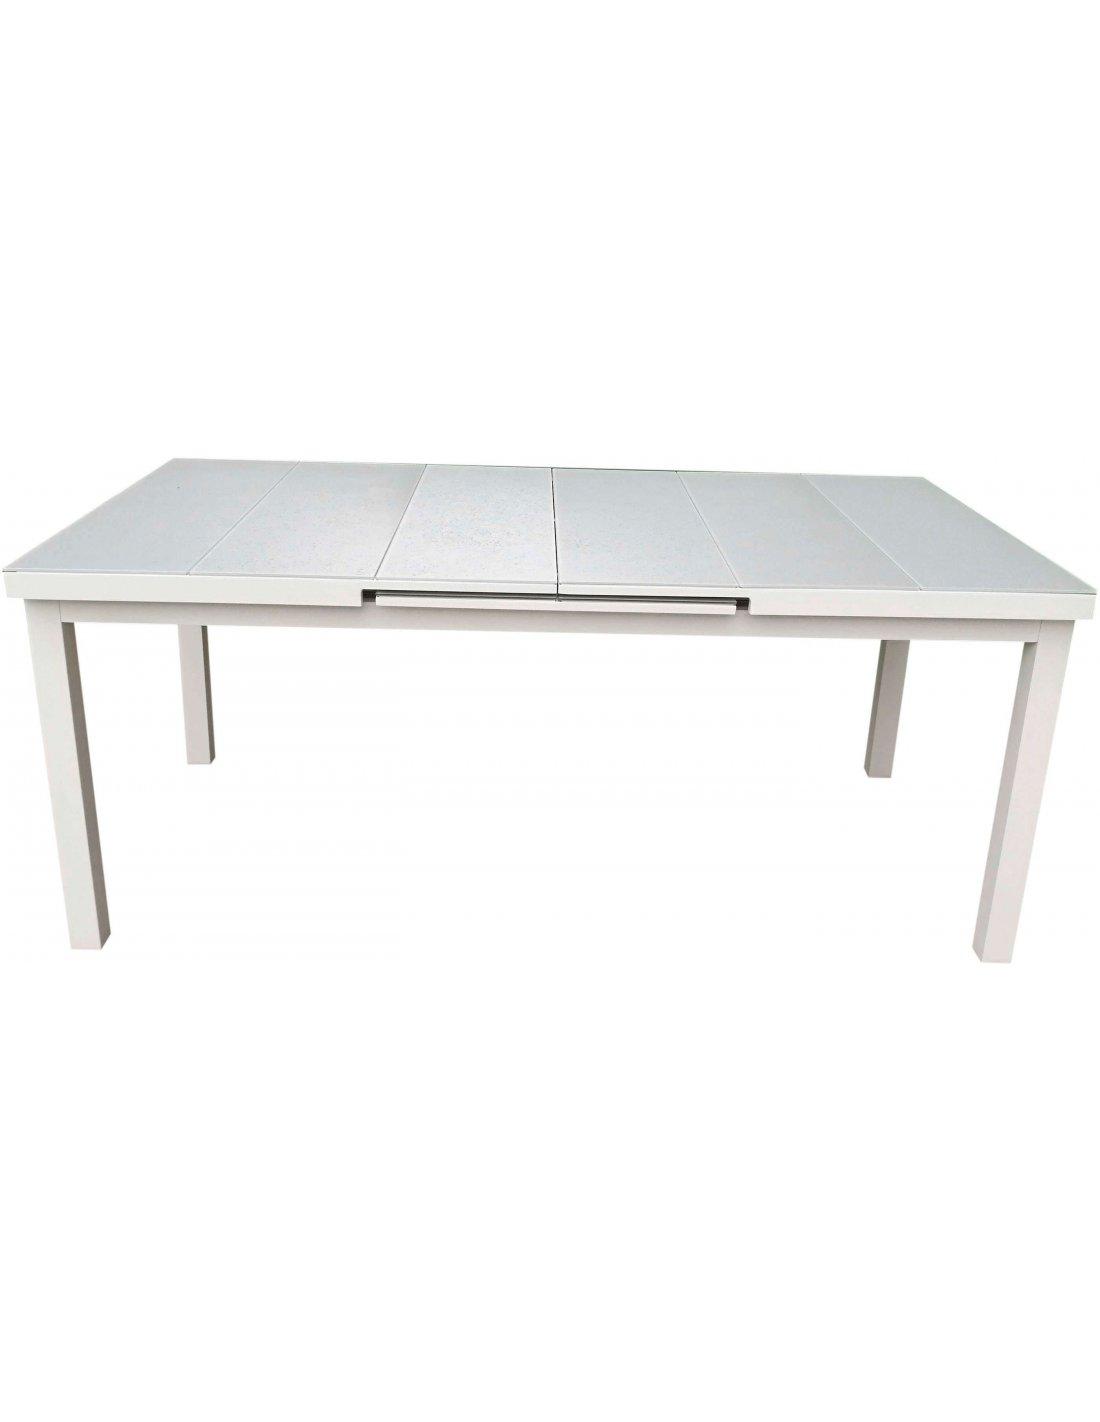 Jardin Extensible Nice AluminiumDelorm Table De XZ0ON8nPwk